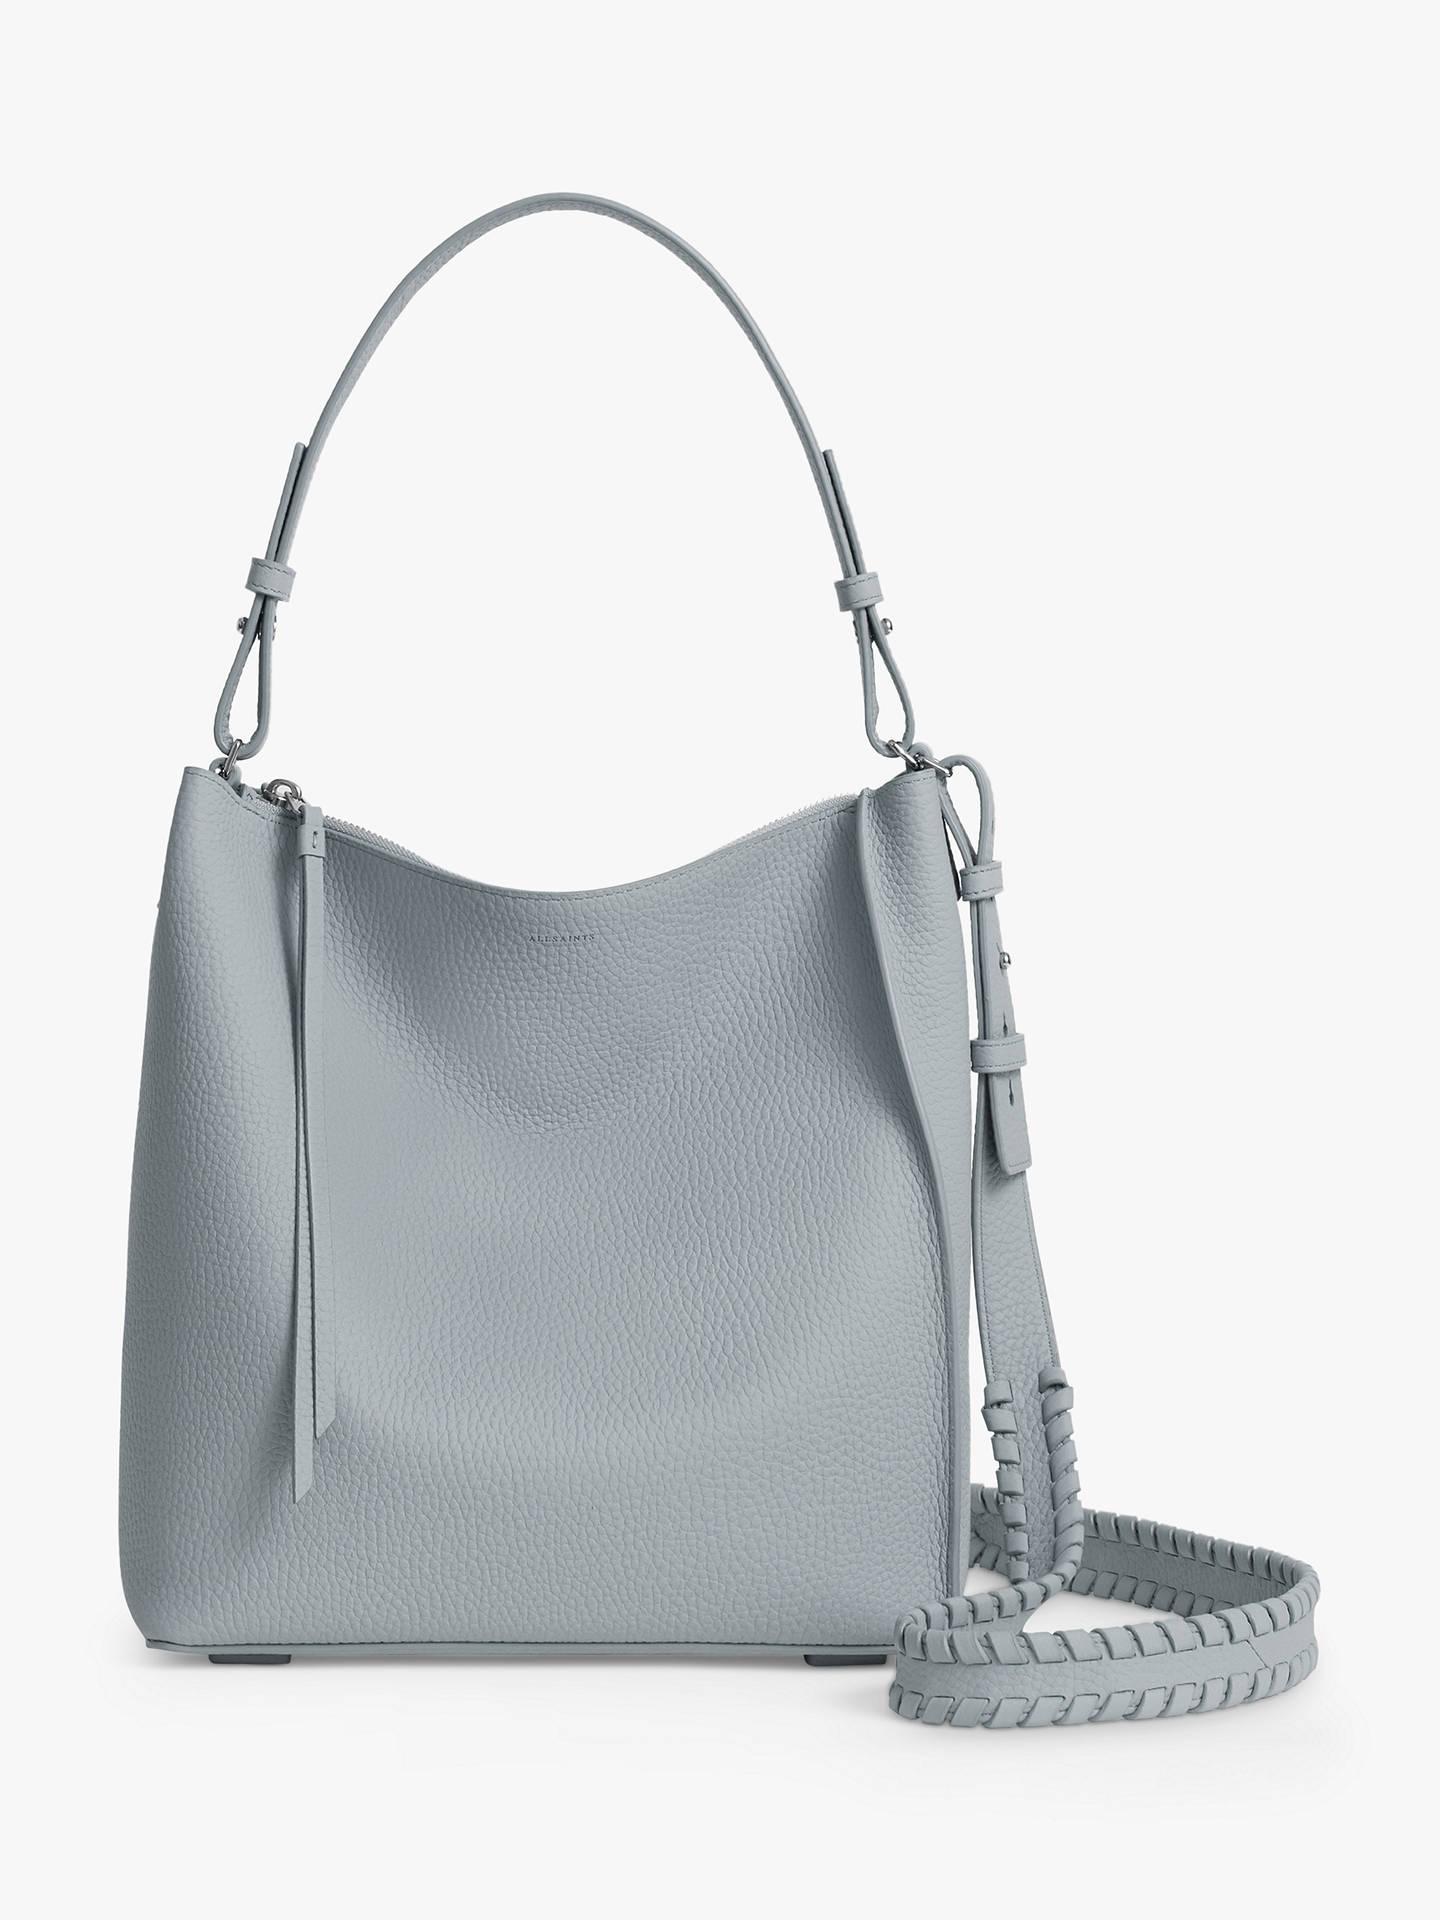 8cb3abc24e78f9 Buy AllSaints Kita Leather Cross Body Bag, Denim Blue Online at  johnlewis.com ...